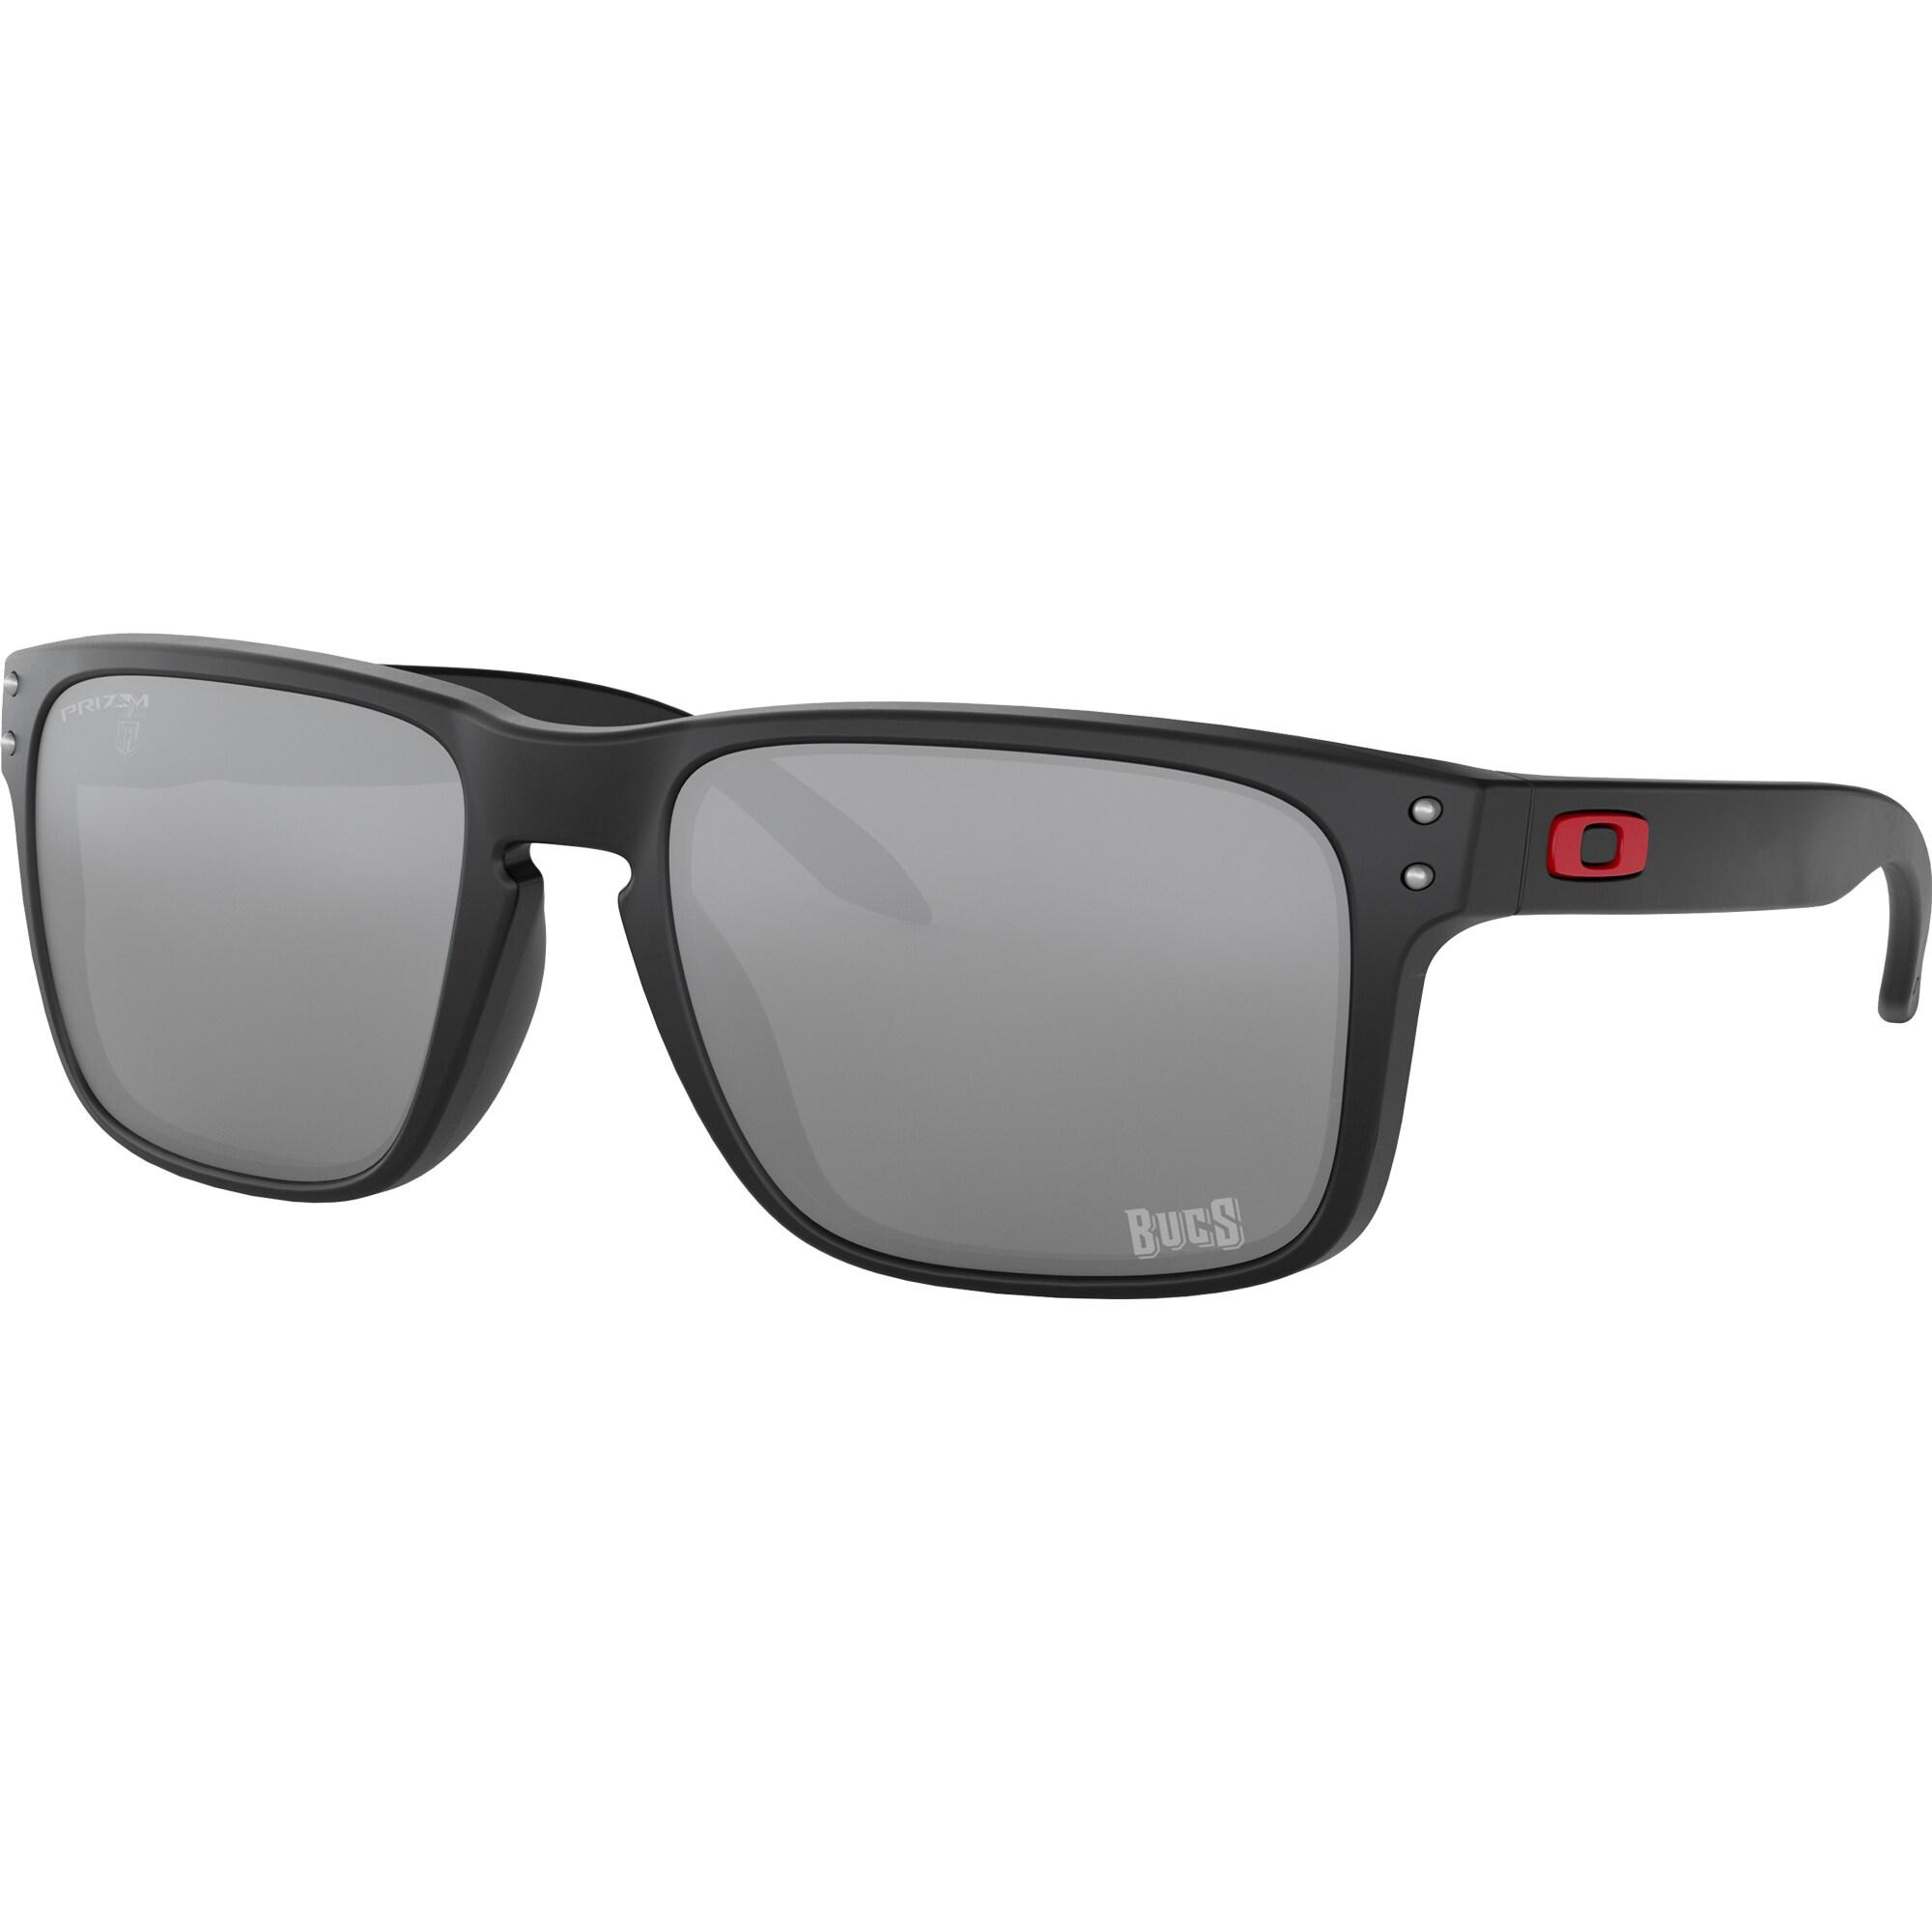 Tampa Bay Buccaneers Oakley Holbrook Sunglasses